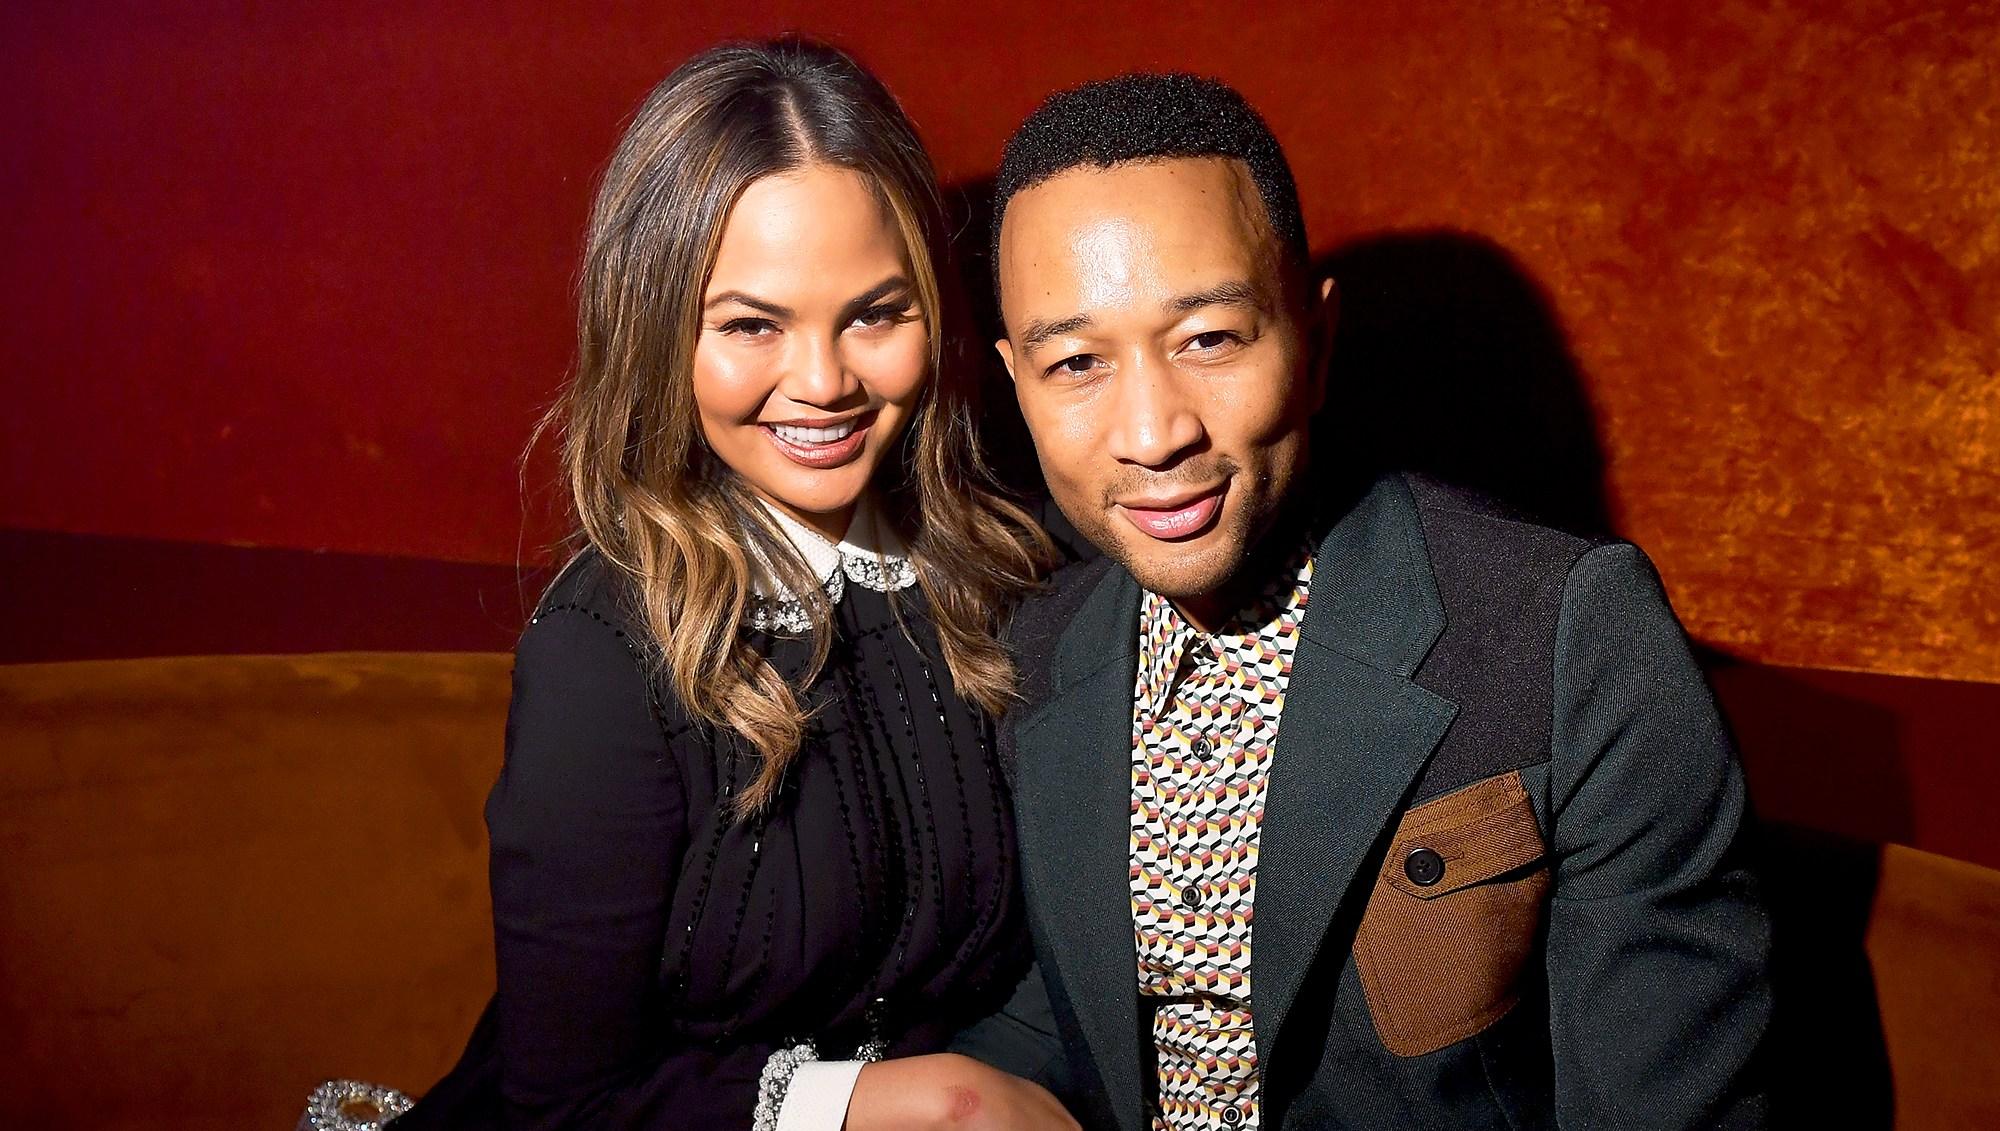 Chrissy Teigen and John Legend attends the Miu Miu aftershow during the Paris Fashion Week at Boum Boum in Paris, France.